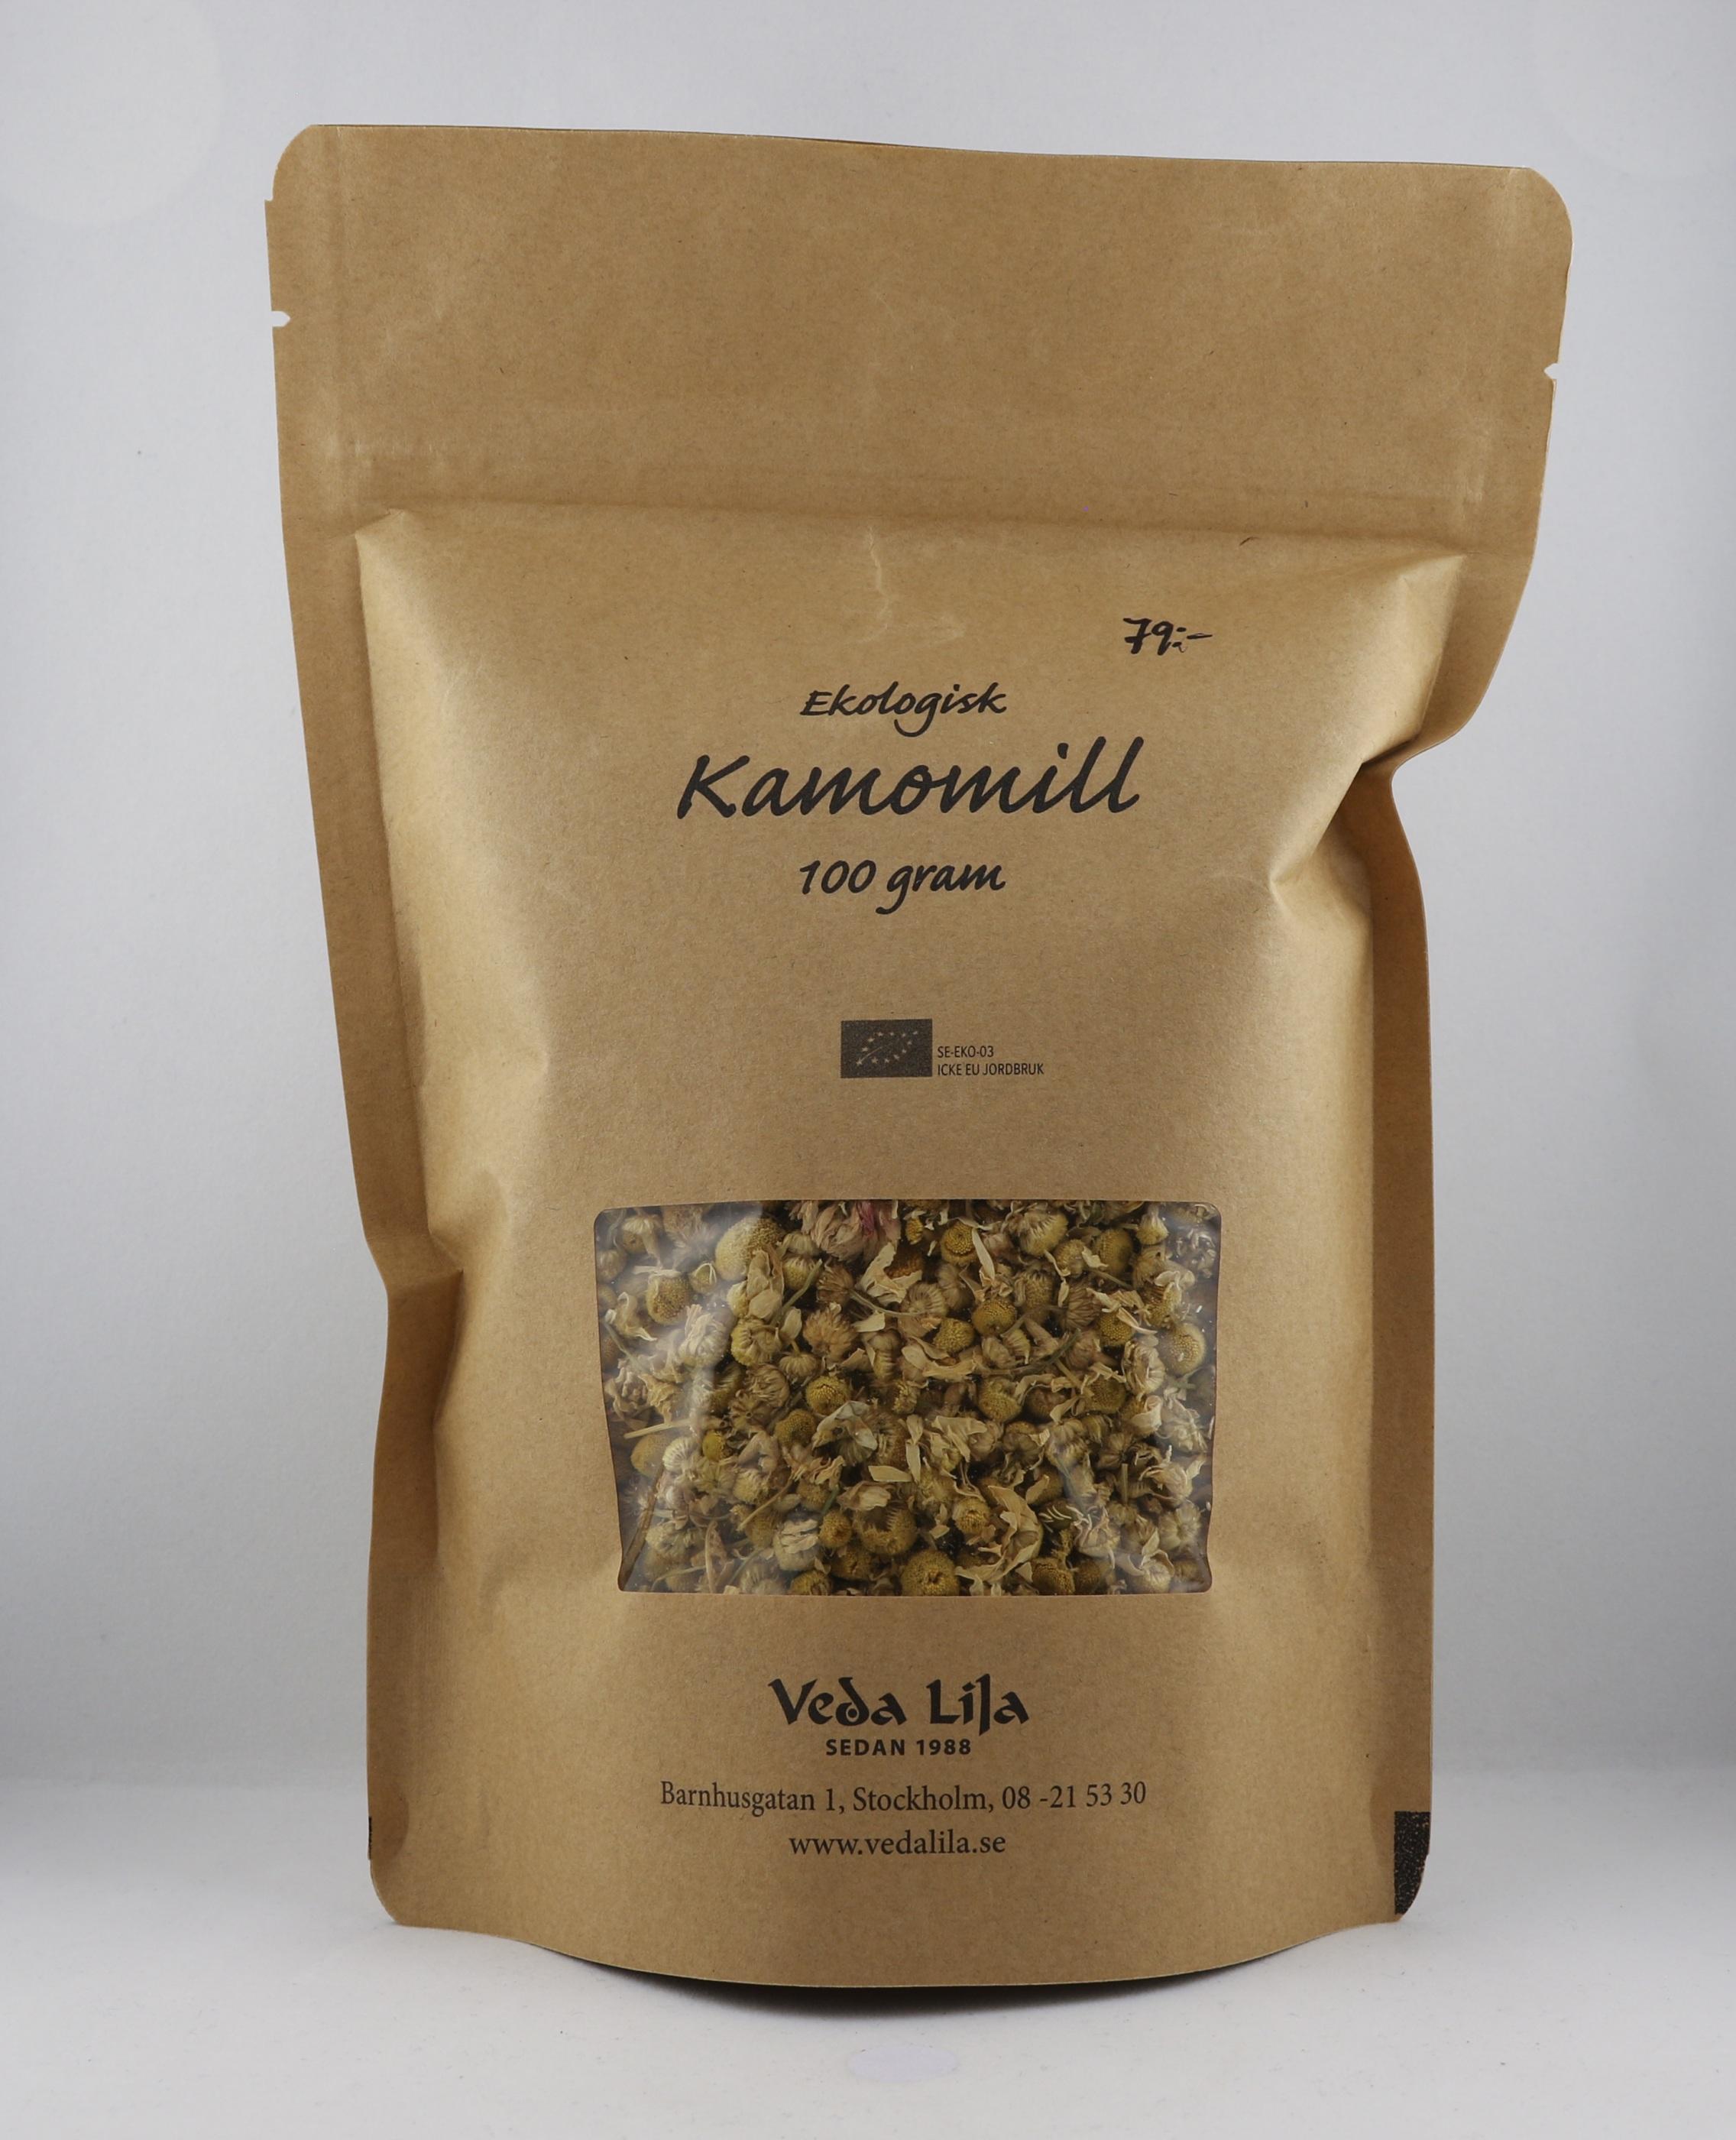 Kamomill te Wellness Ayurveda Halmstadmassören Halmstad Sverige Sweden svensk eko ekologiskt